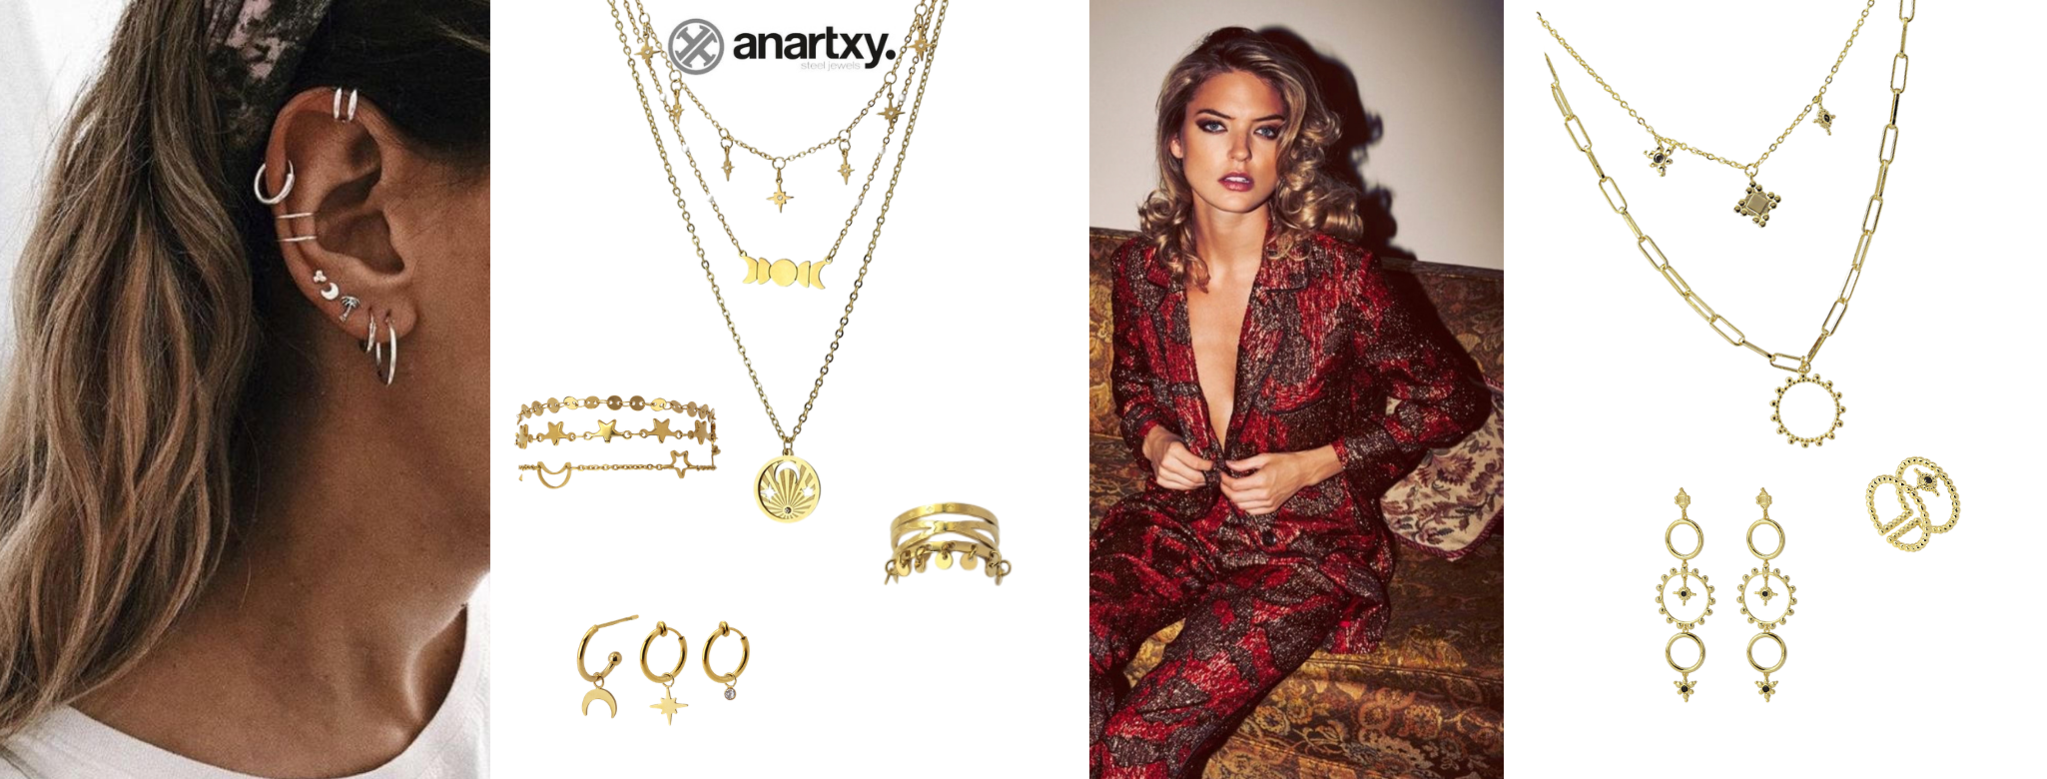 juwelen anartxy